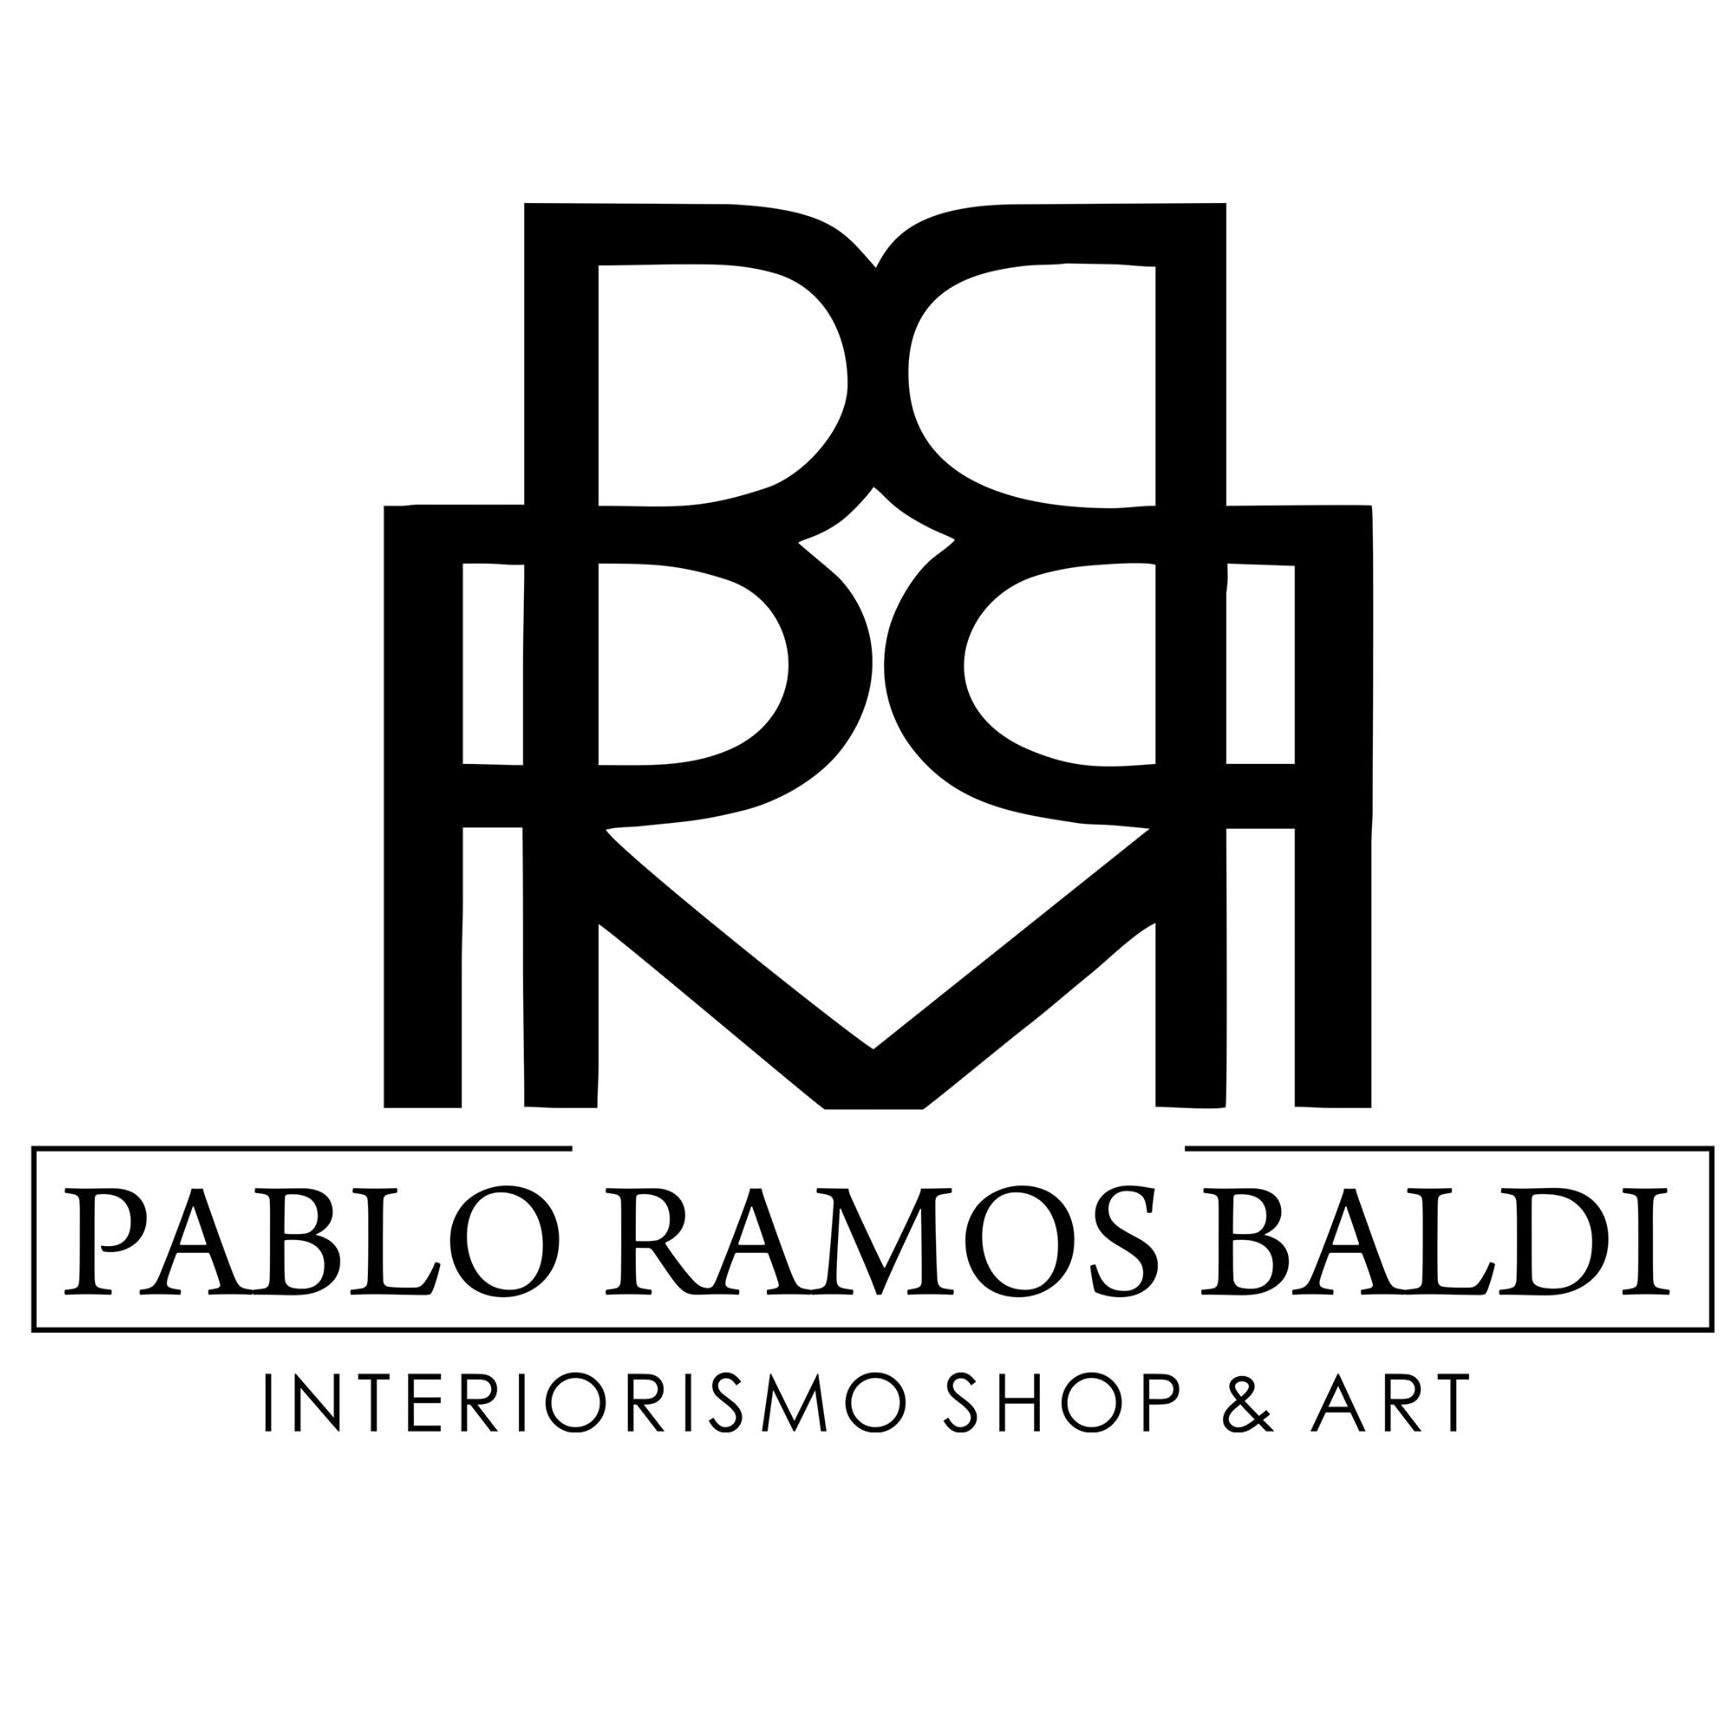 Pablo ramos baldi sl